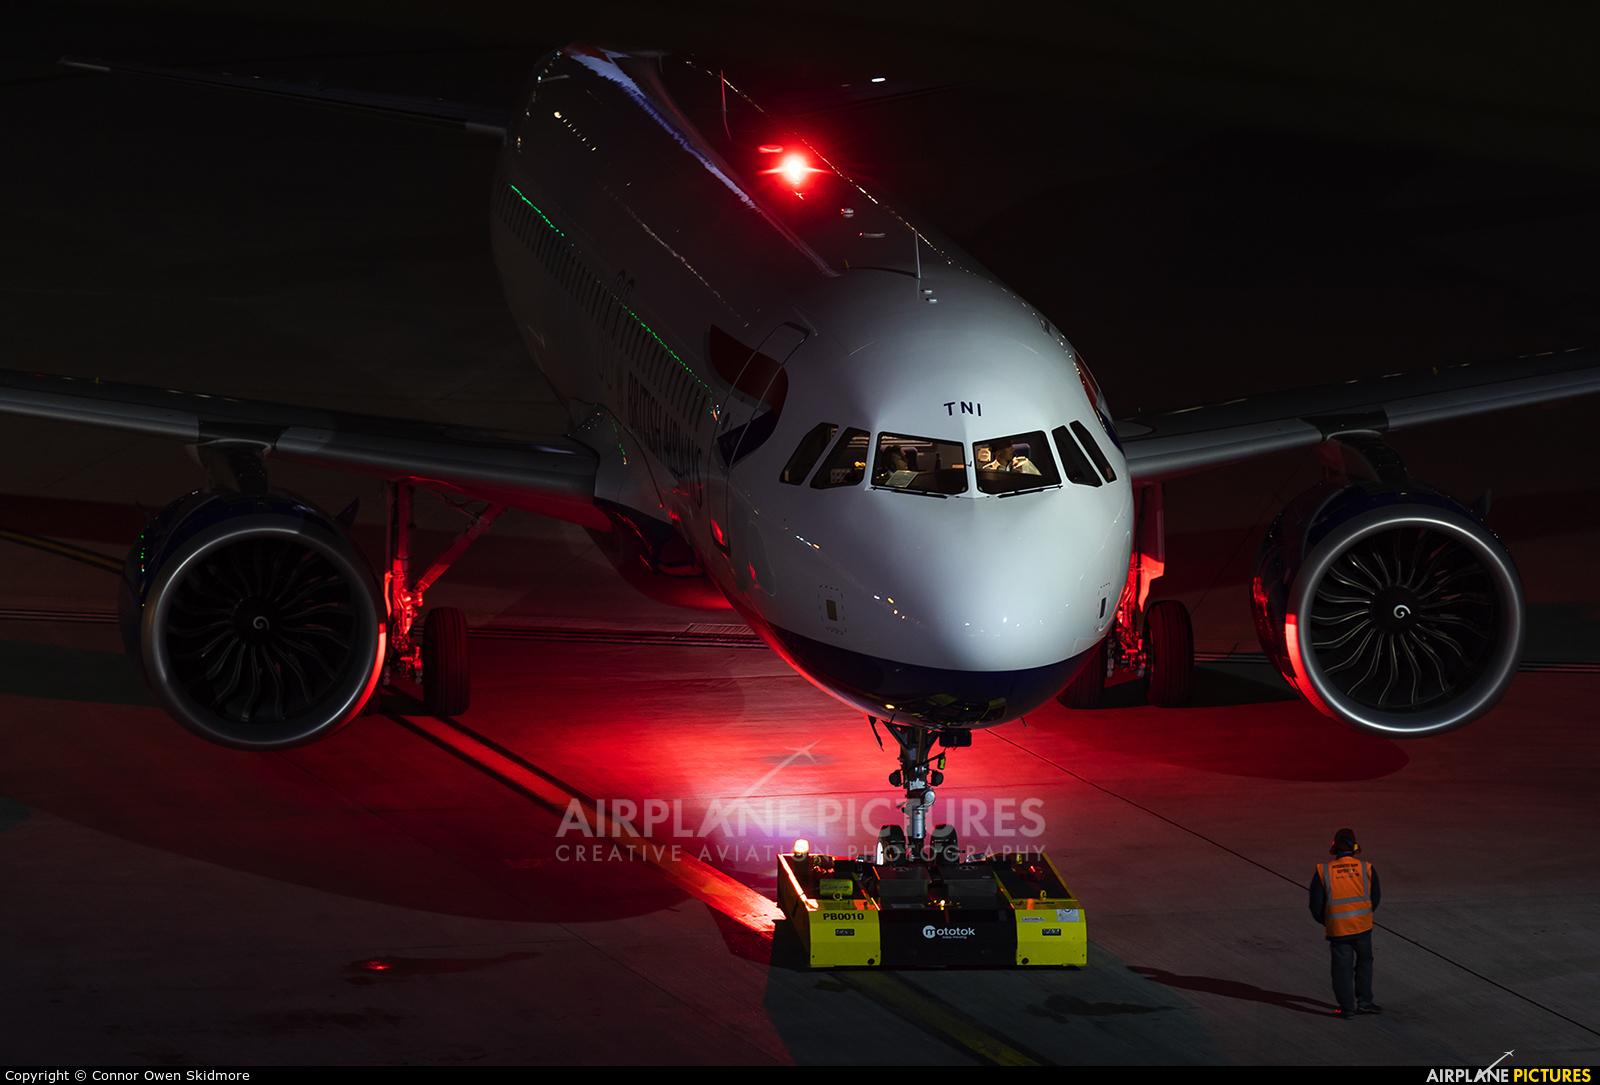 British Airways G-TTNI aircraft at London - Heathrow